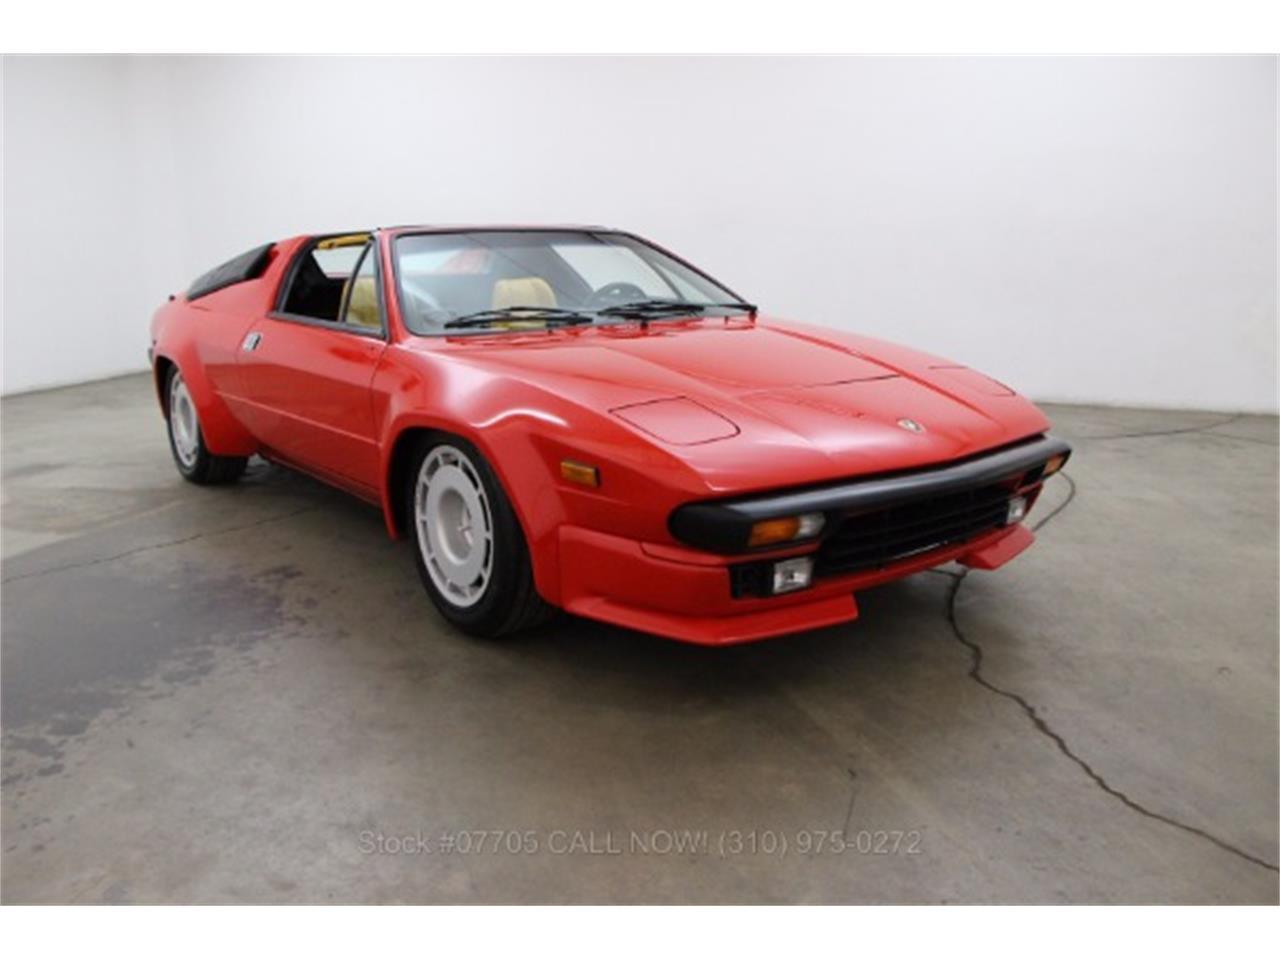 1986 Lamborghini Jalpa For Sale Classiccars Com Cc 923818